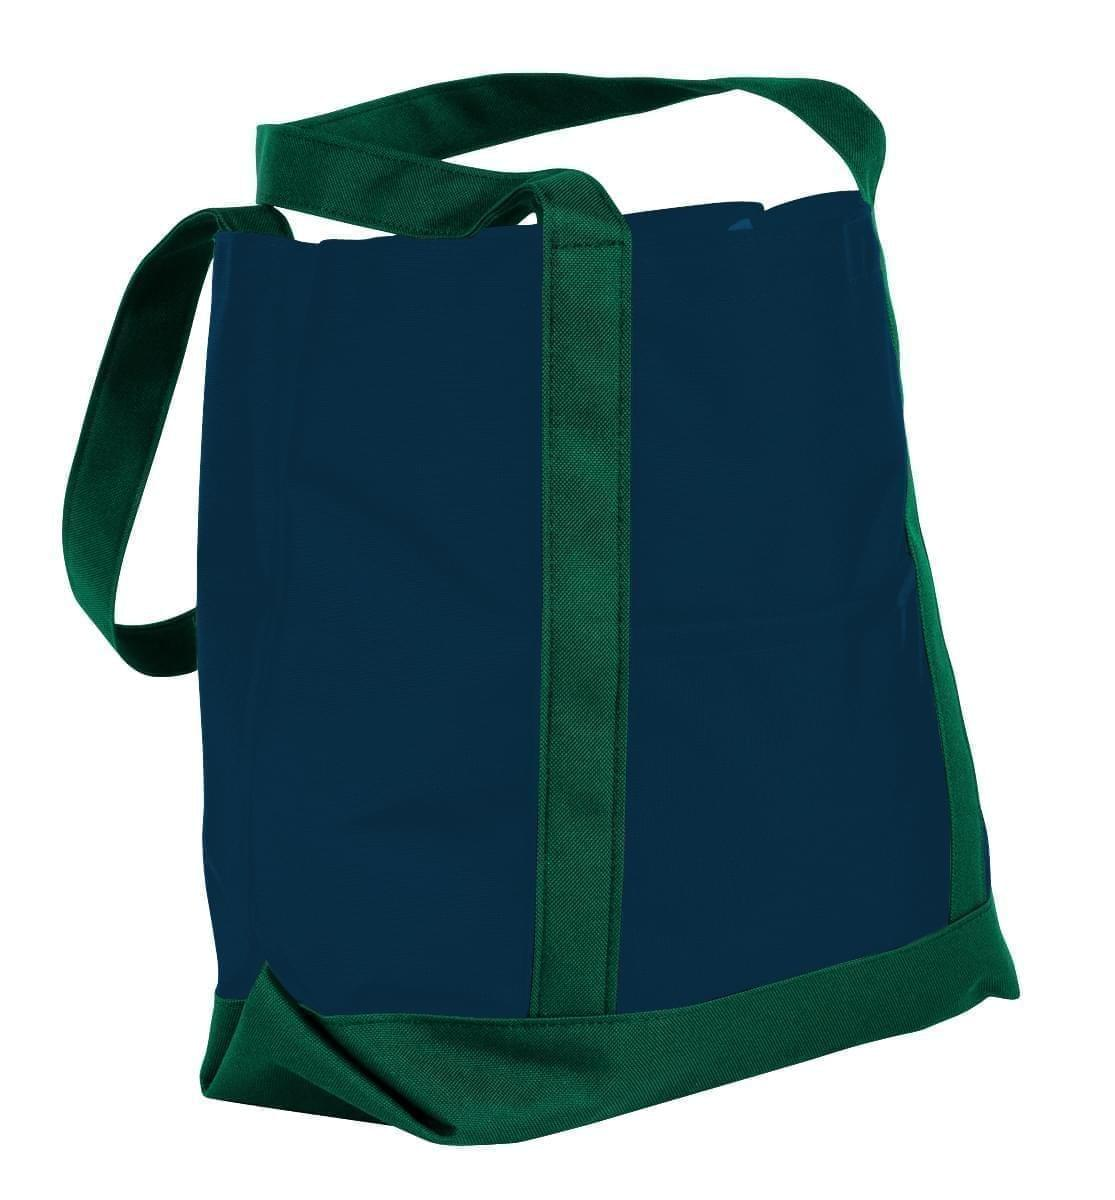 USA Made Nylon Poly Boat Tote Bags, Navy-Hunter Green, XAACL1UAWV